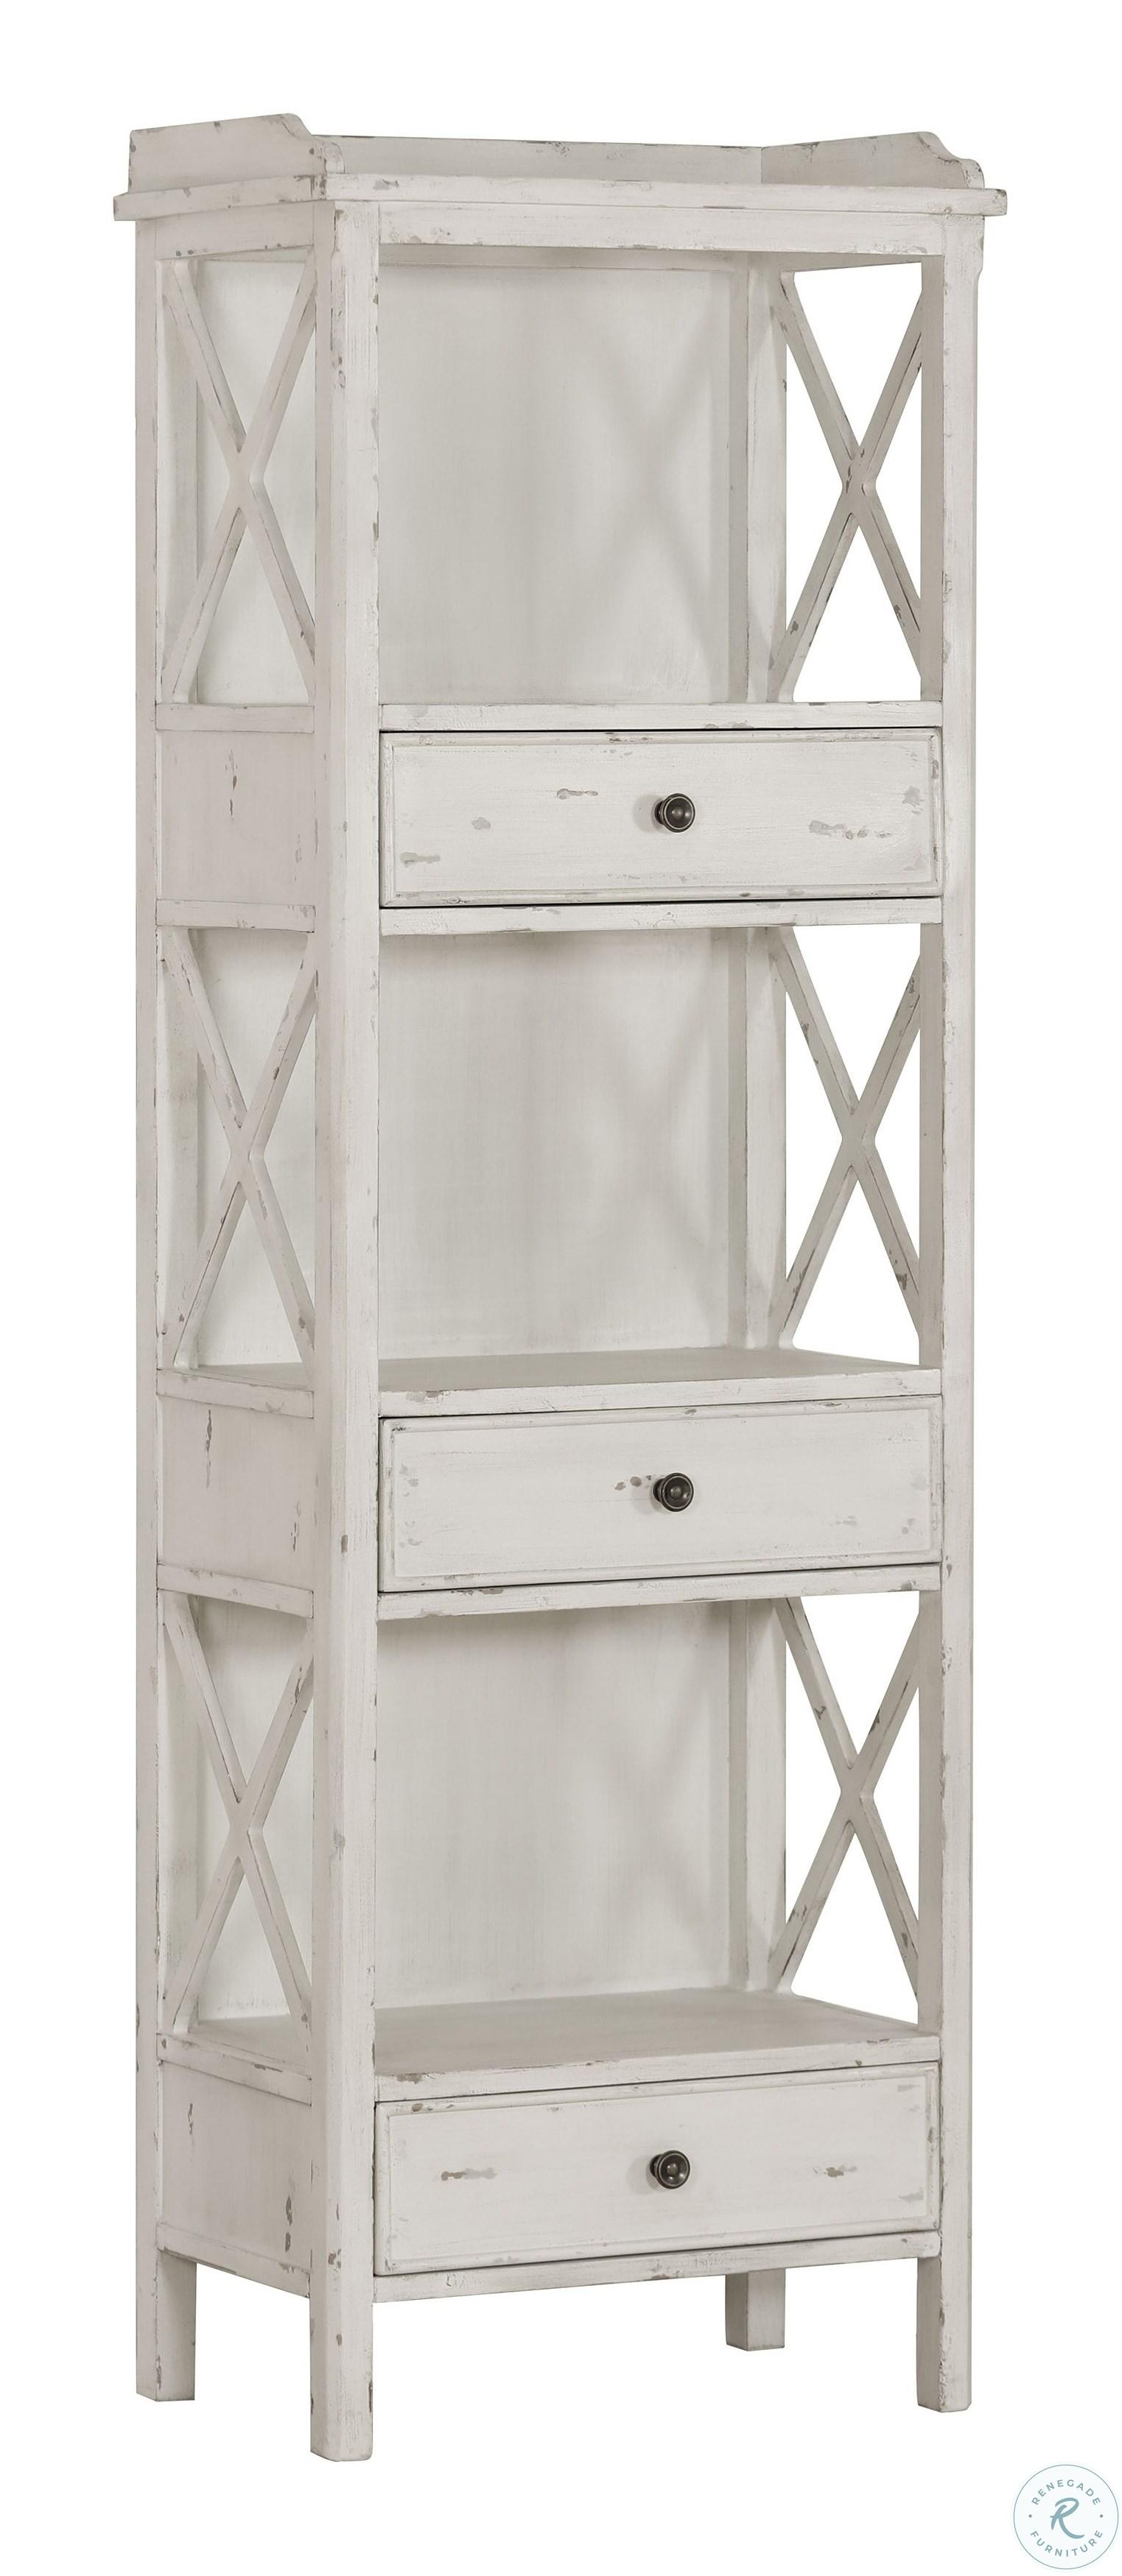 Weathered White Bookshelf From Pulaski Coleman Furniture